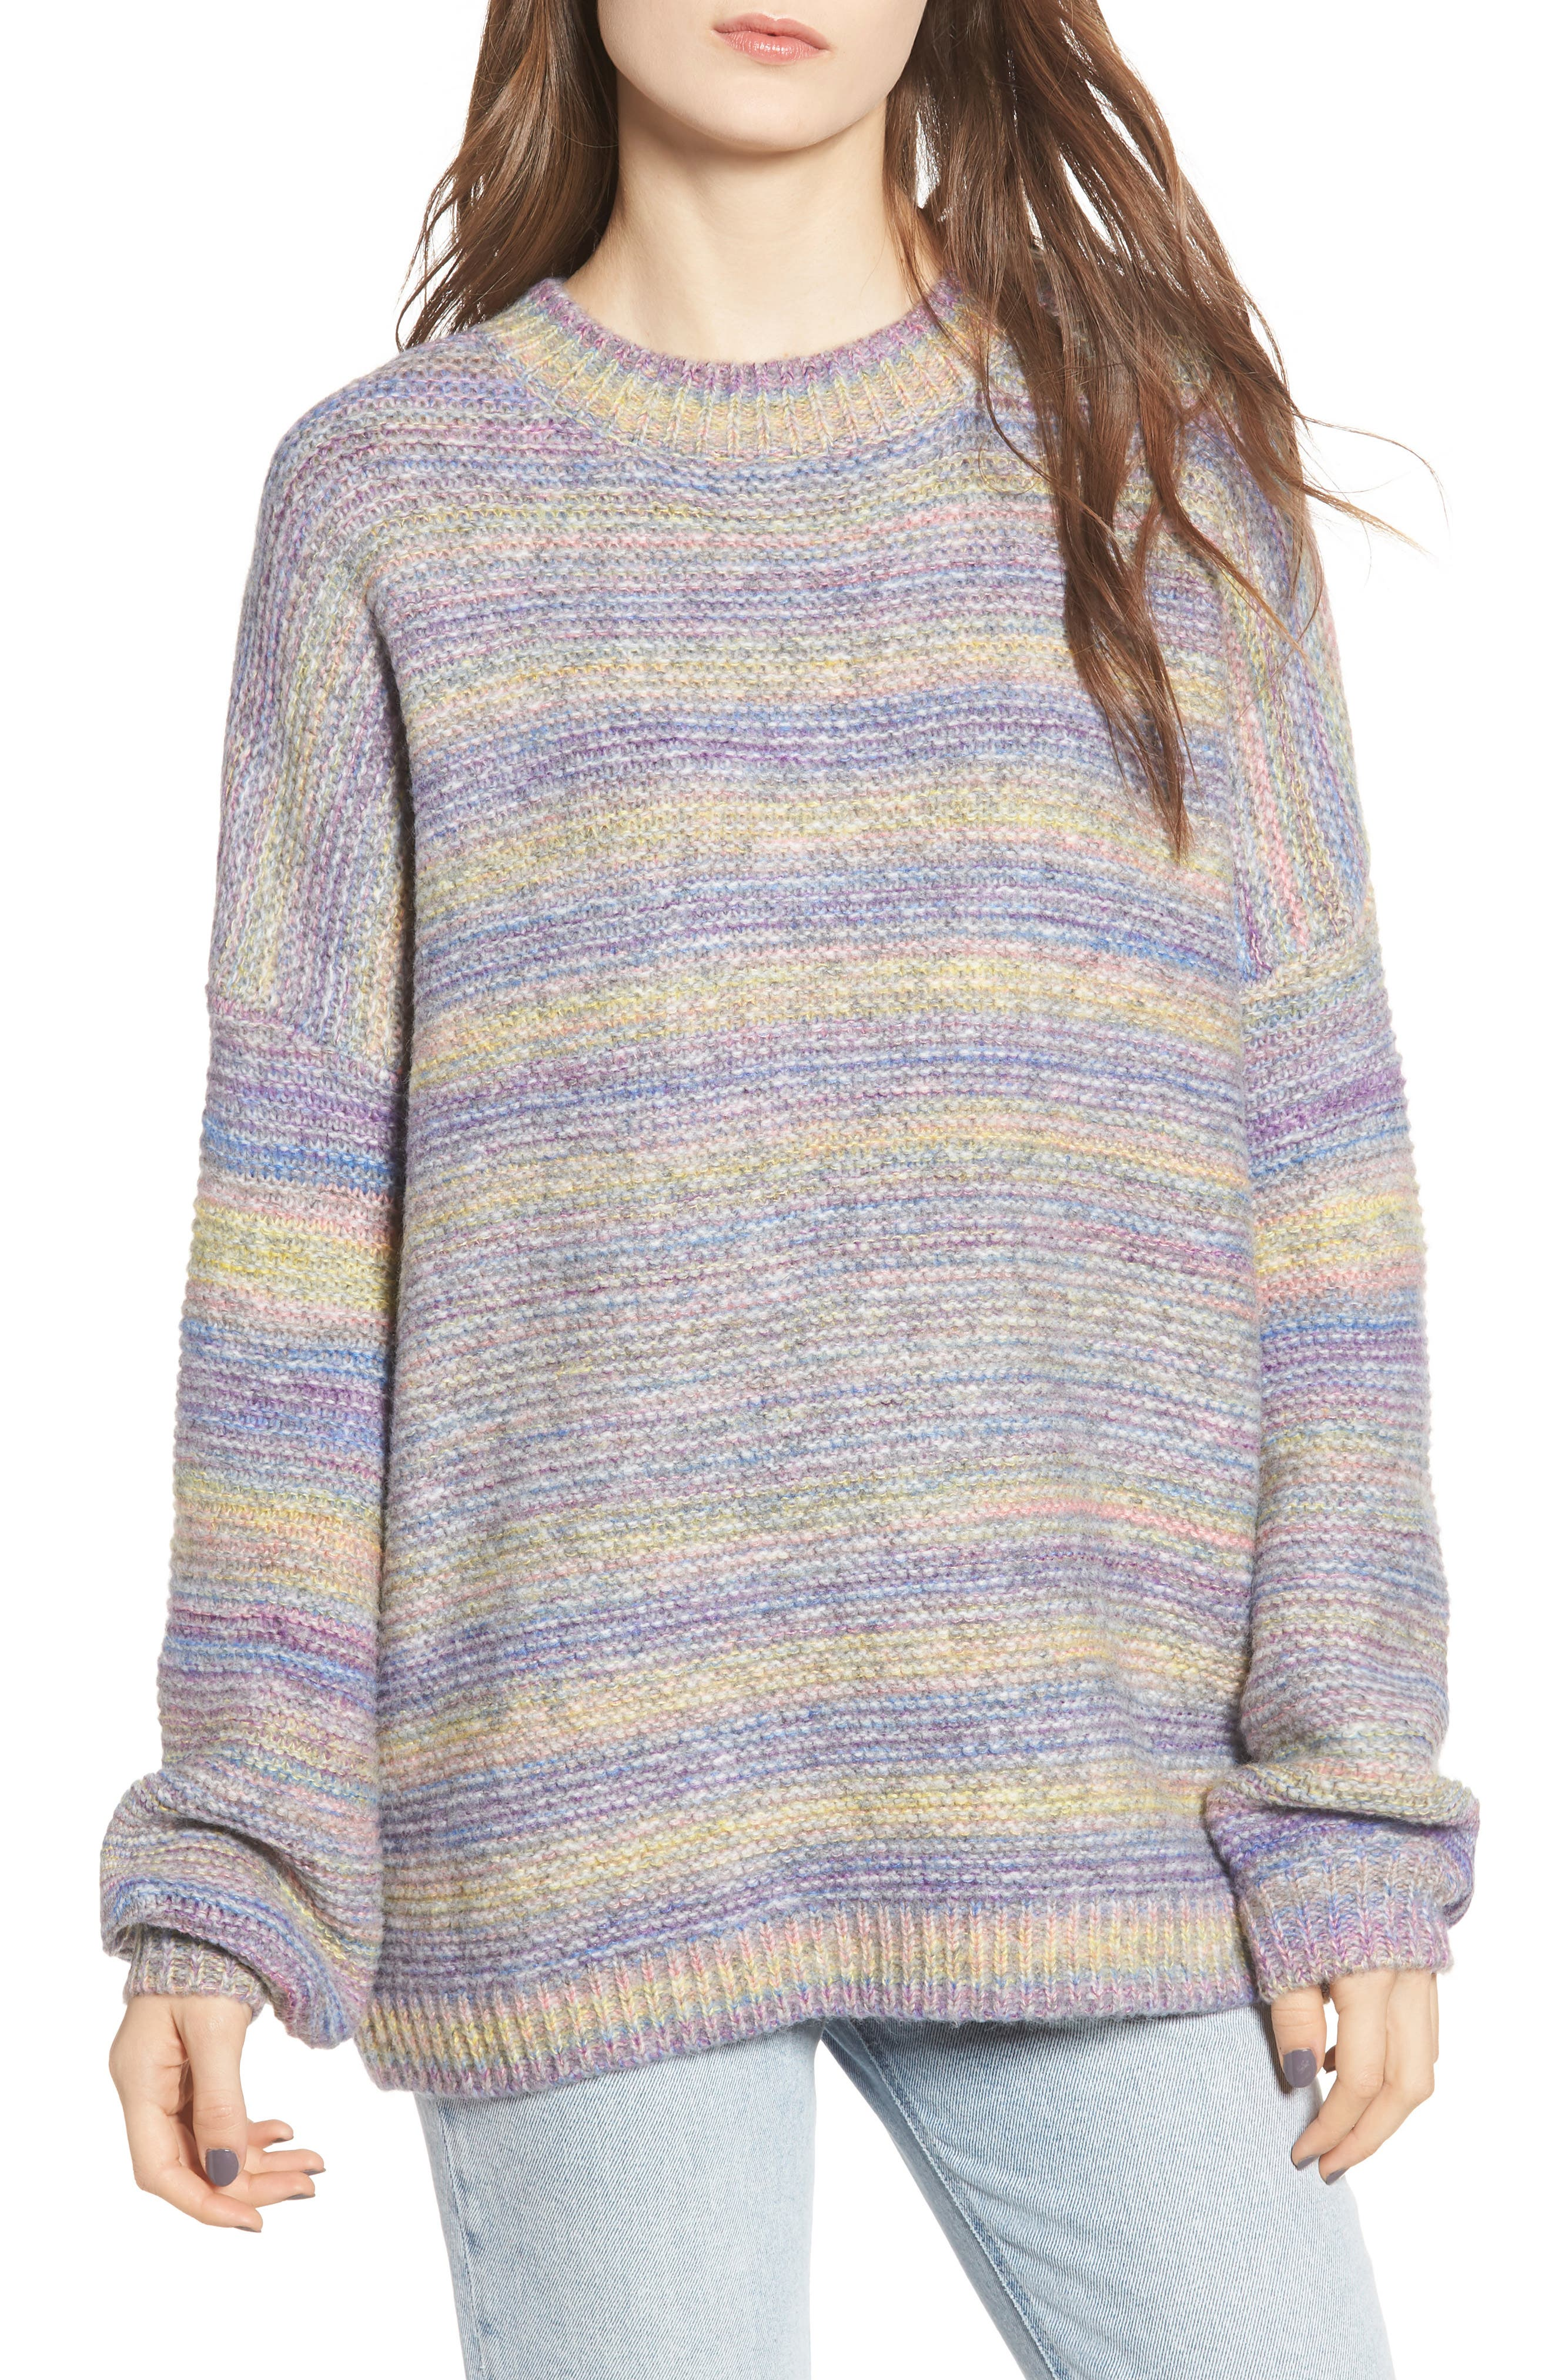 PROSPERITY DENIM Rainbow Marl Sweater, Main, color, YELLOW